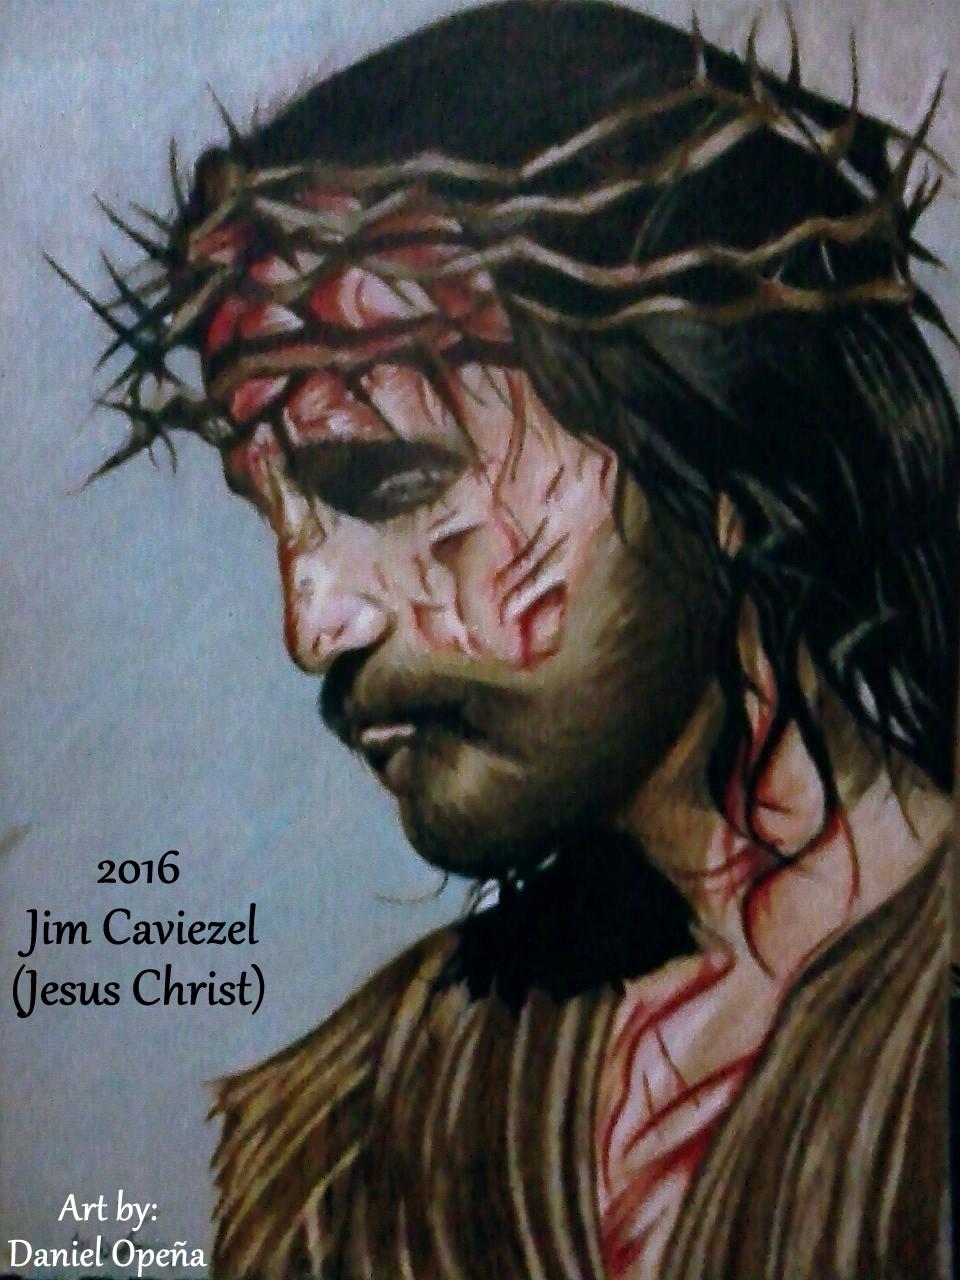 Jim Caviezel (Jesus Christ) (2016) by nielopena